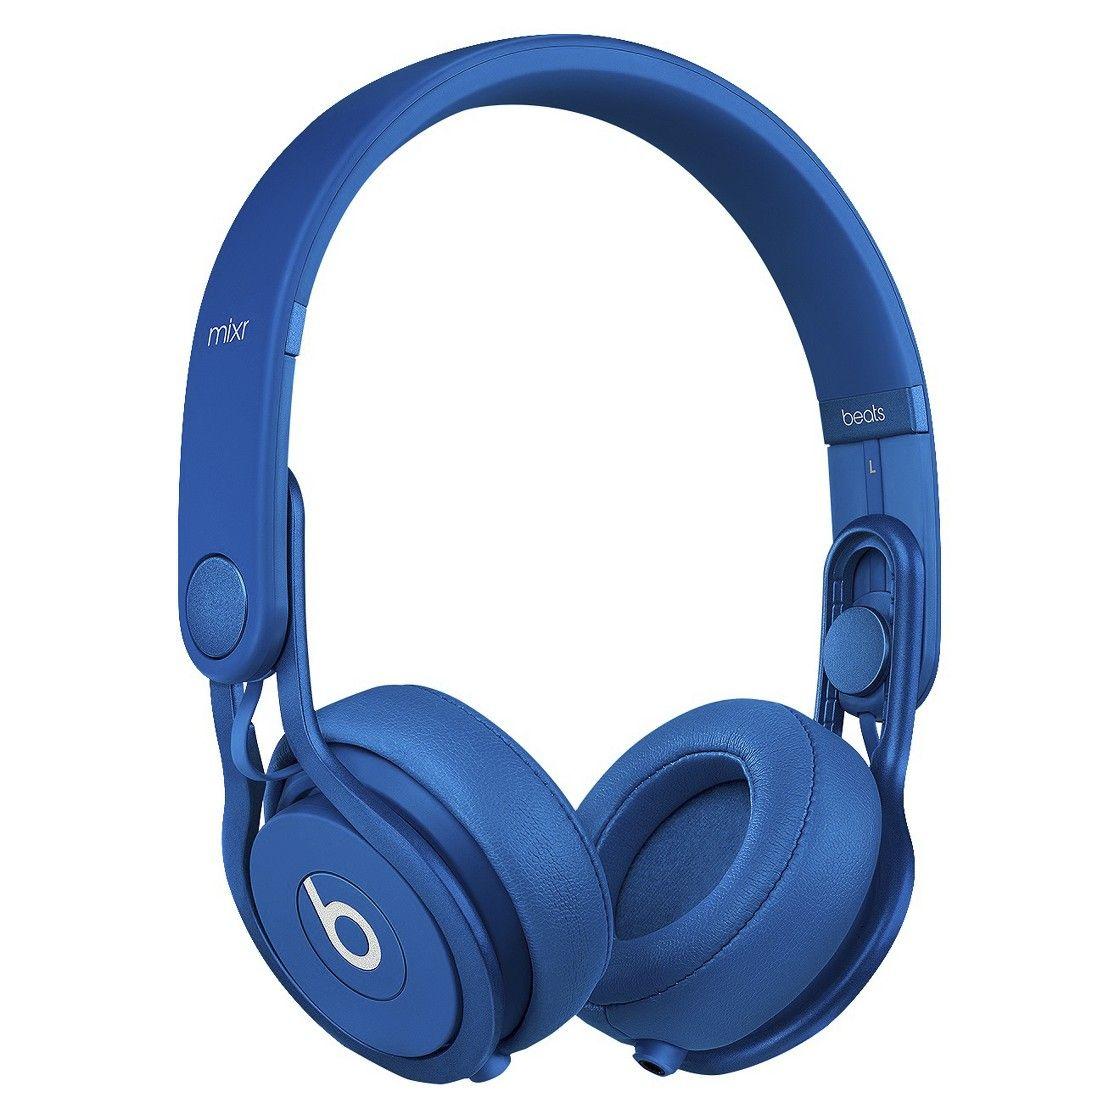 Beats by Dre Colr Mixr Headphones - Assorted Colors